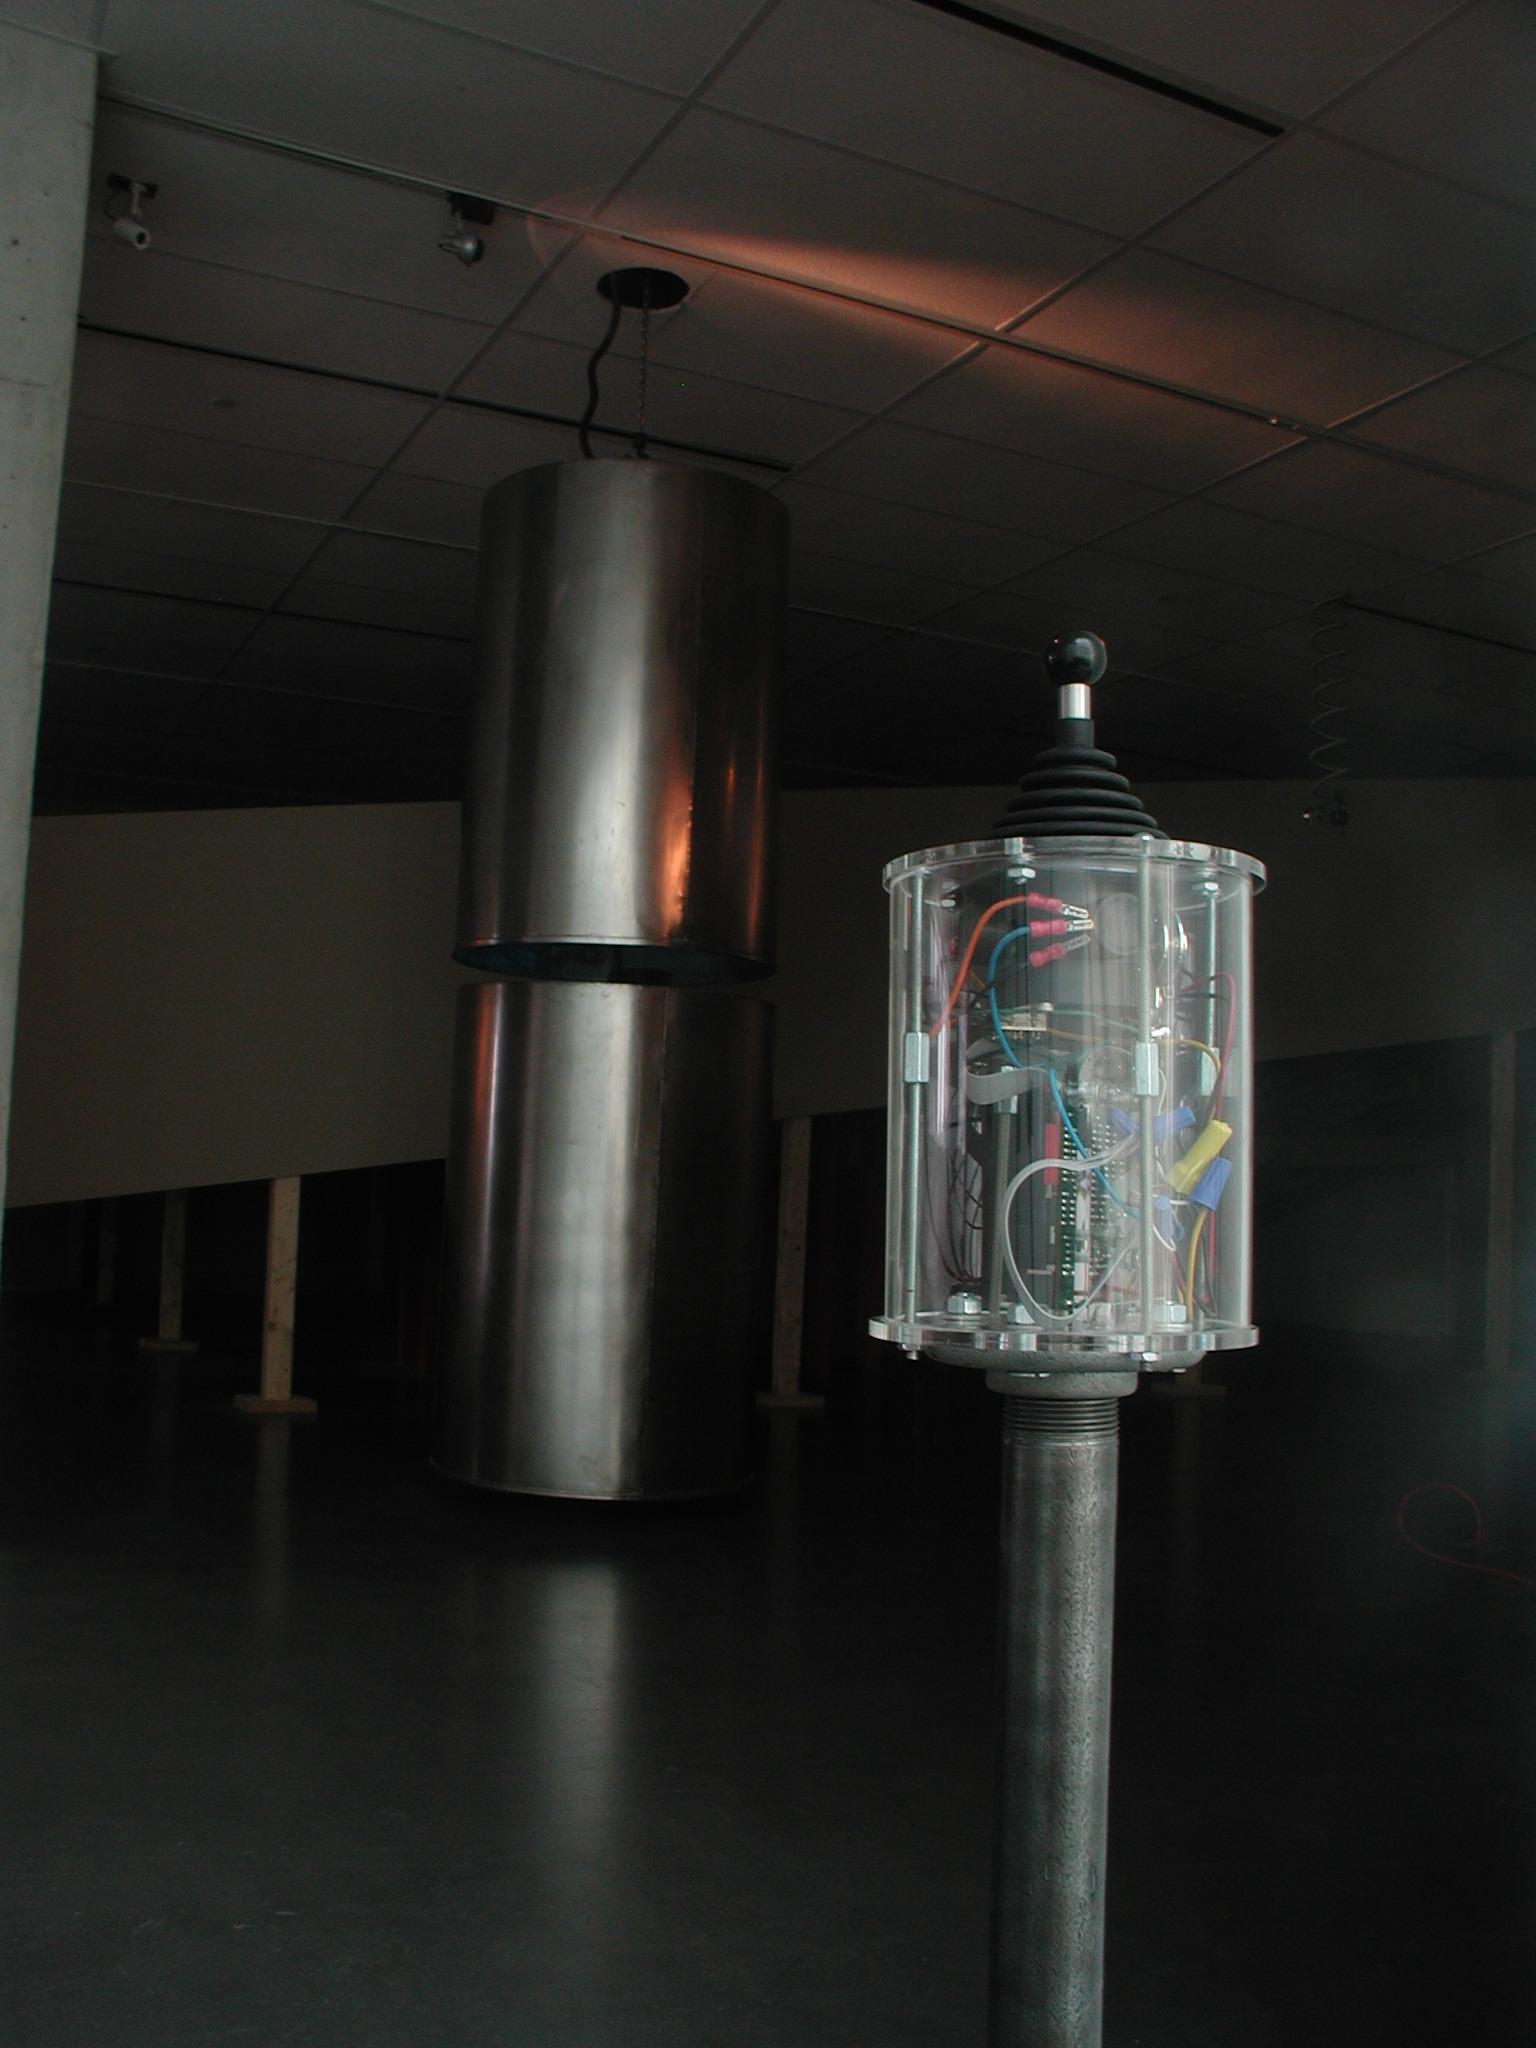 Steel Drums   stainless steel vats, subwoofer drivers, joystick, electronics, computer  4' diameter x 10' high / 2003